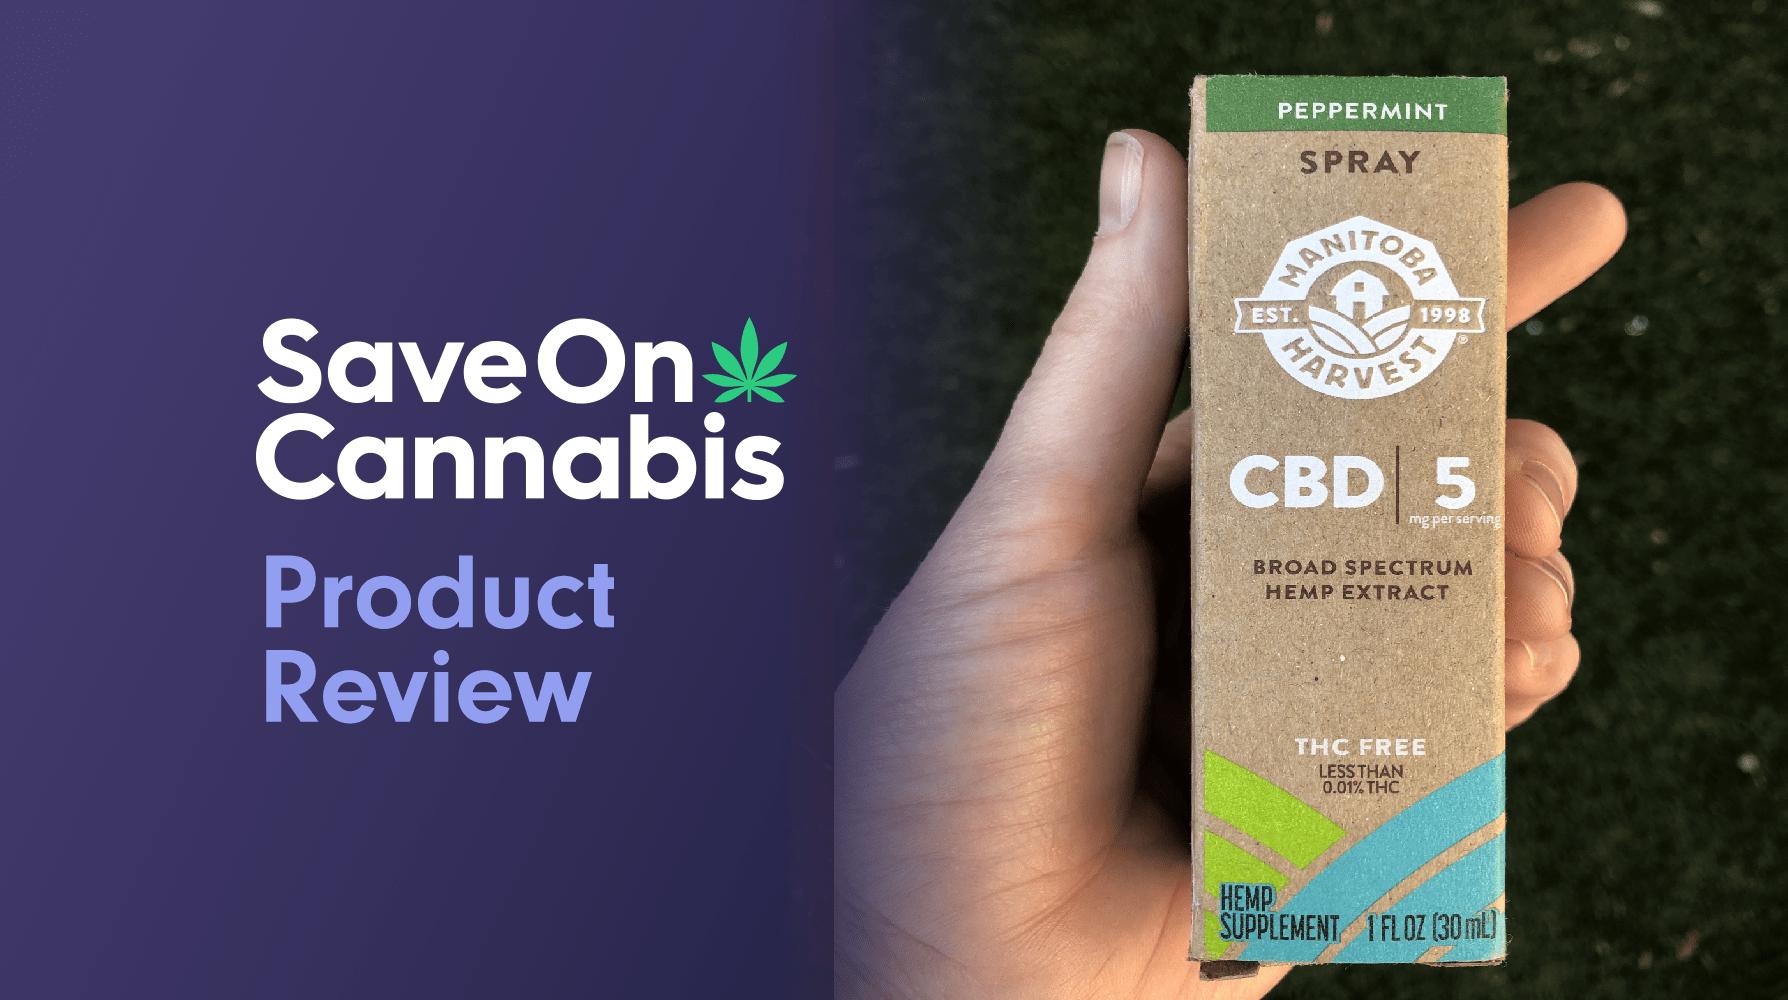 manitoba harvest cbd peppermint spray save on cannabis website